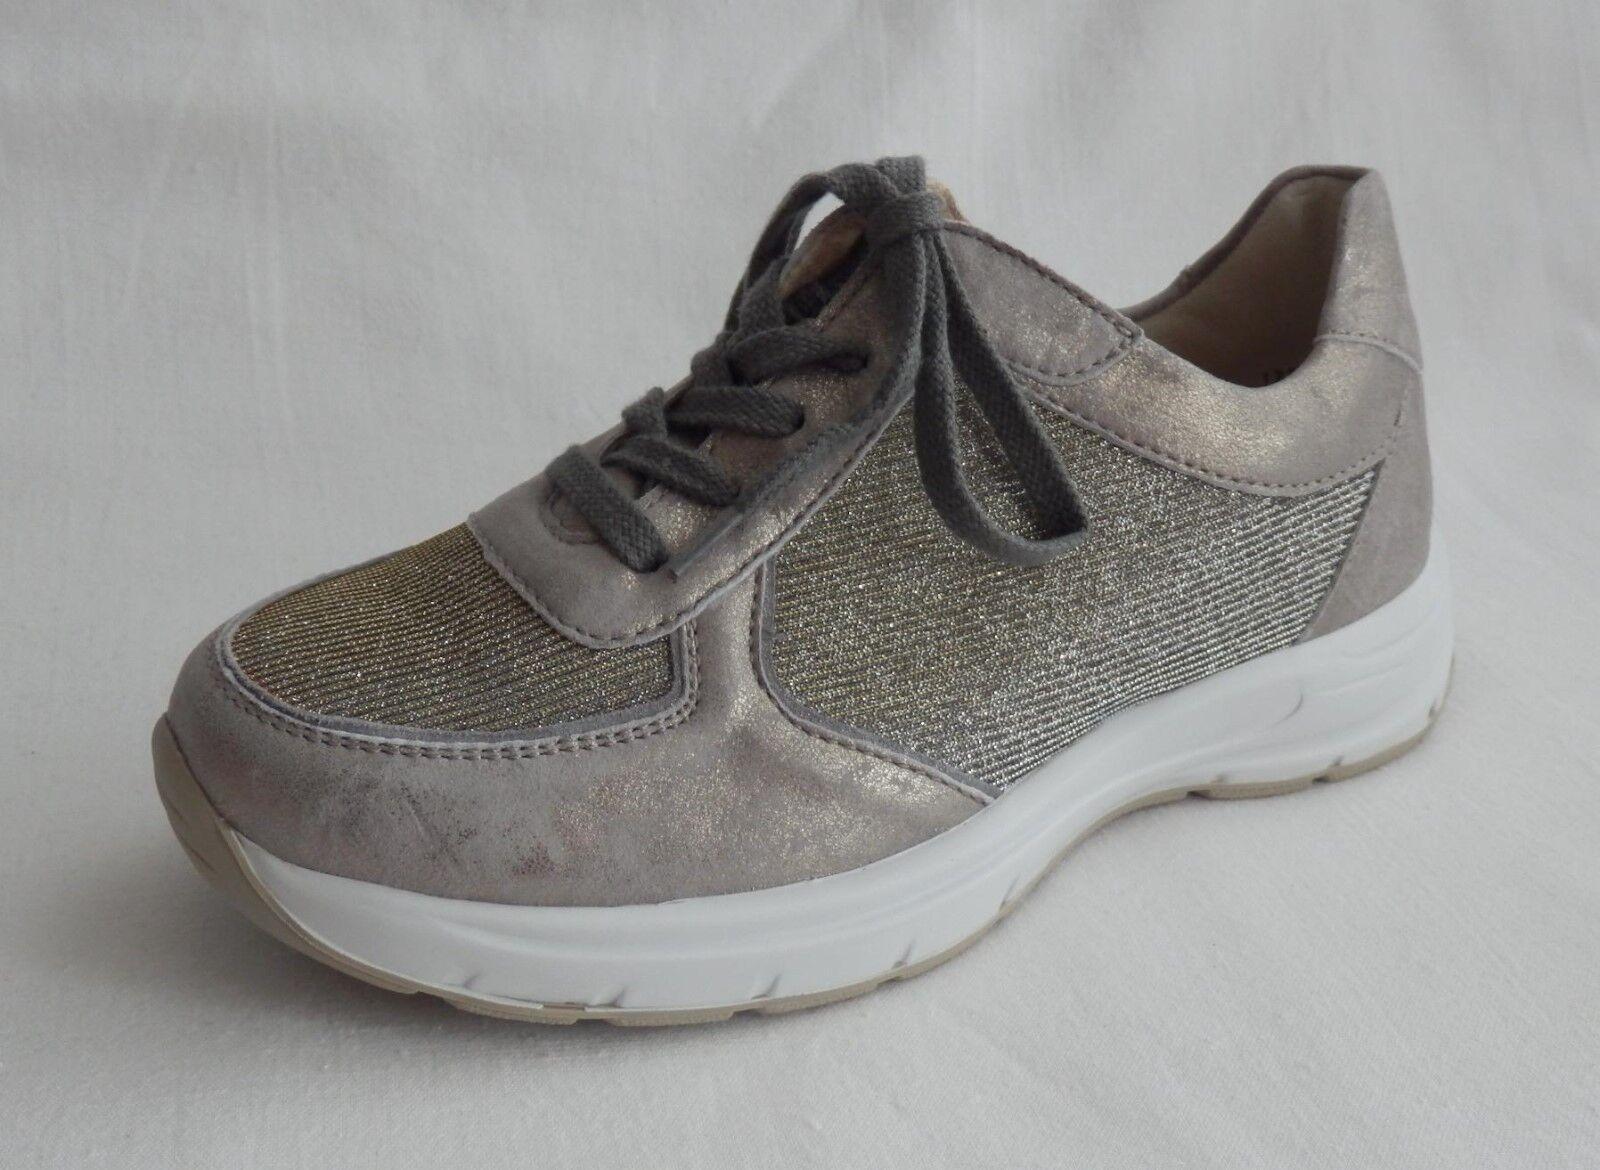 Semler Sneaker Grigio Oro Nubuck NUOVO Larghezza H Tg. 33 NUOVO Nubuck bdc2fd